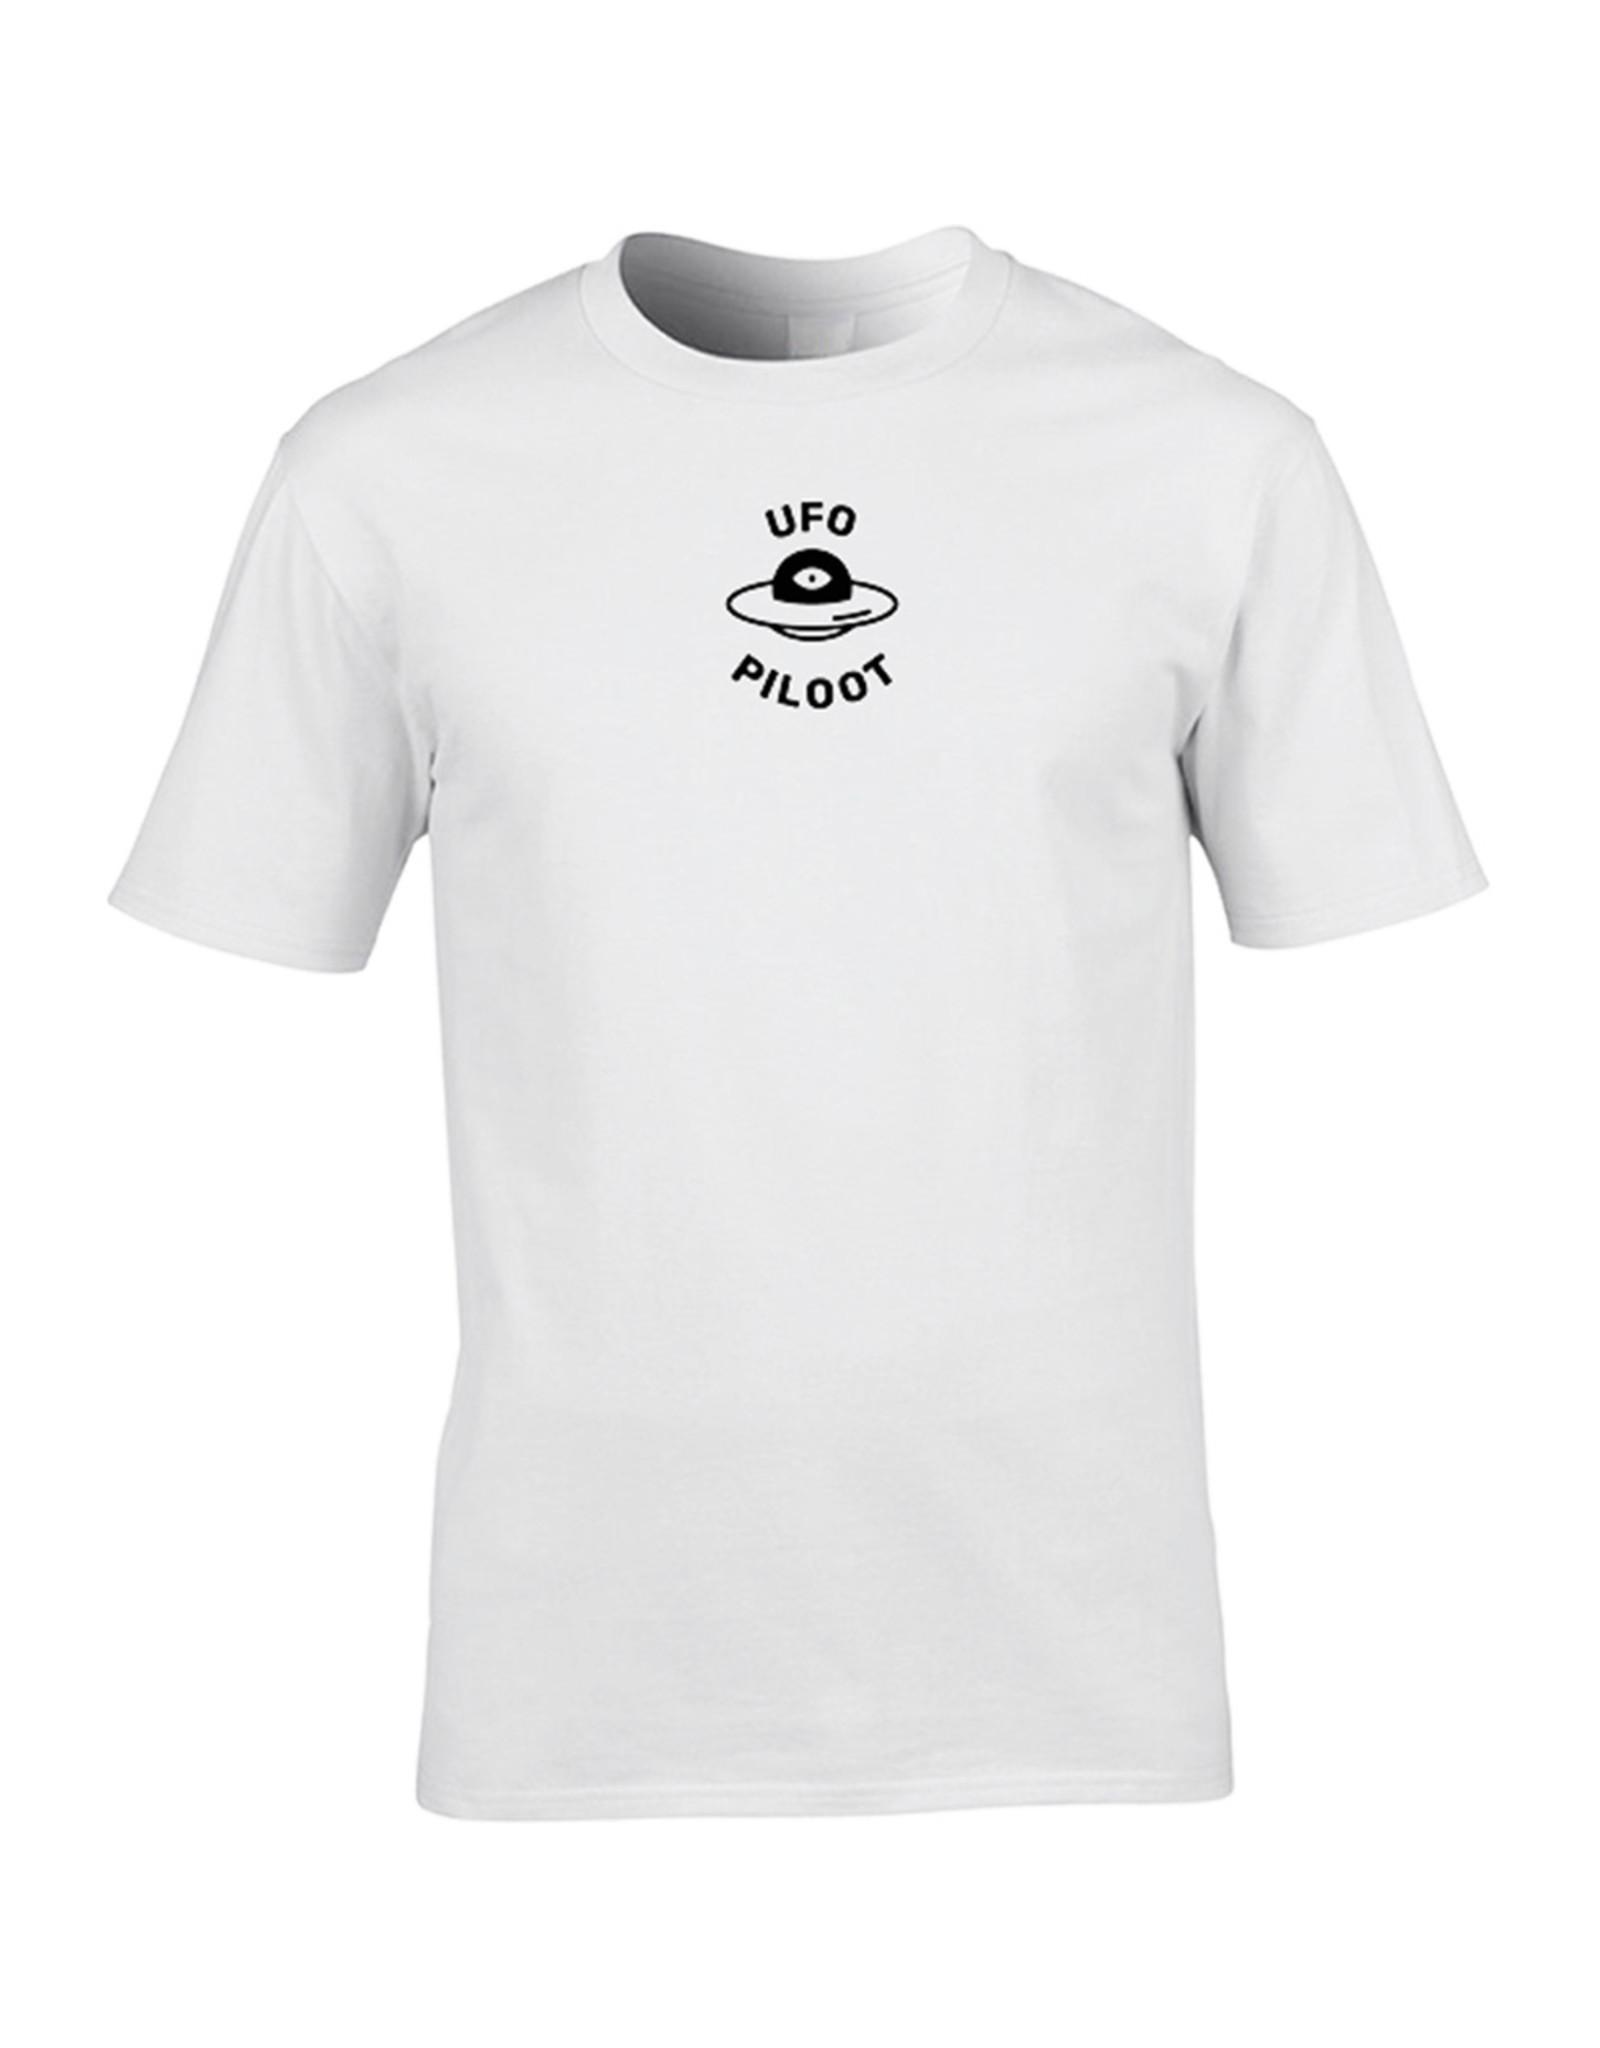 Festicap T-Shirt UFO Piloot | Soft Cotton | Handmade by us